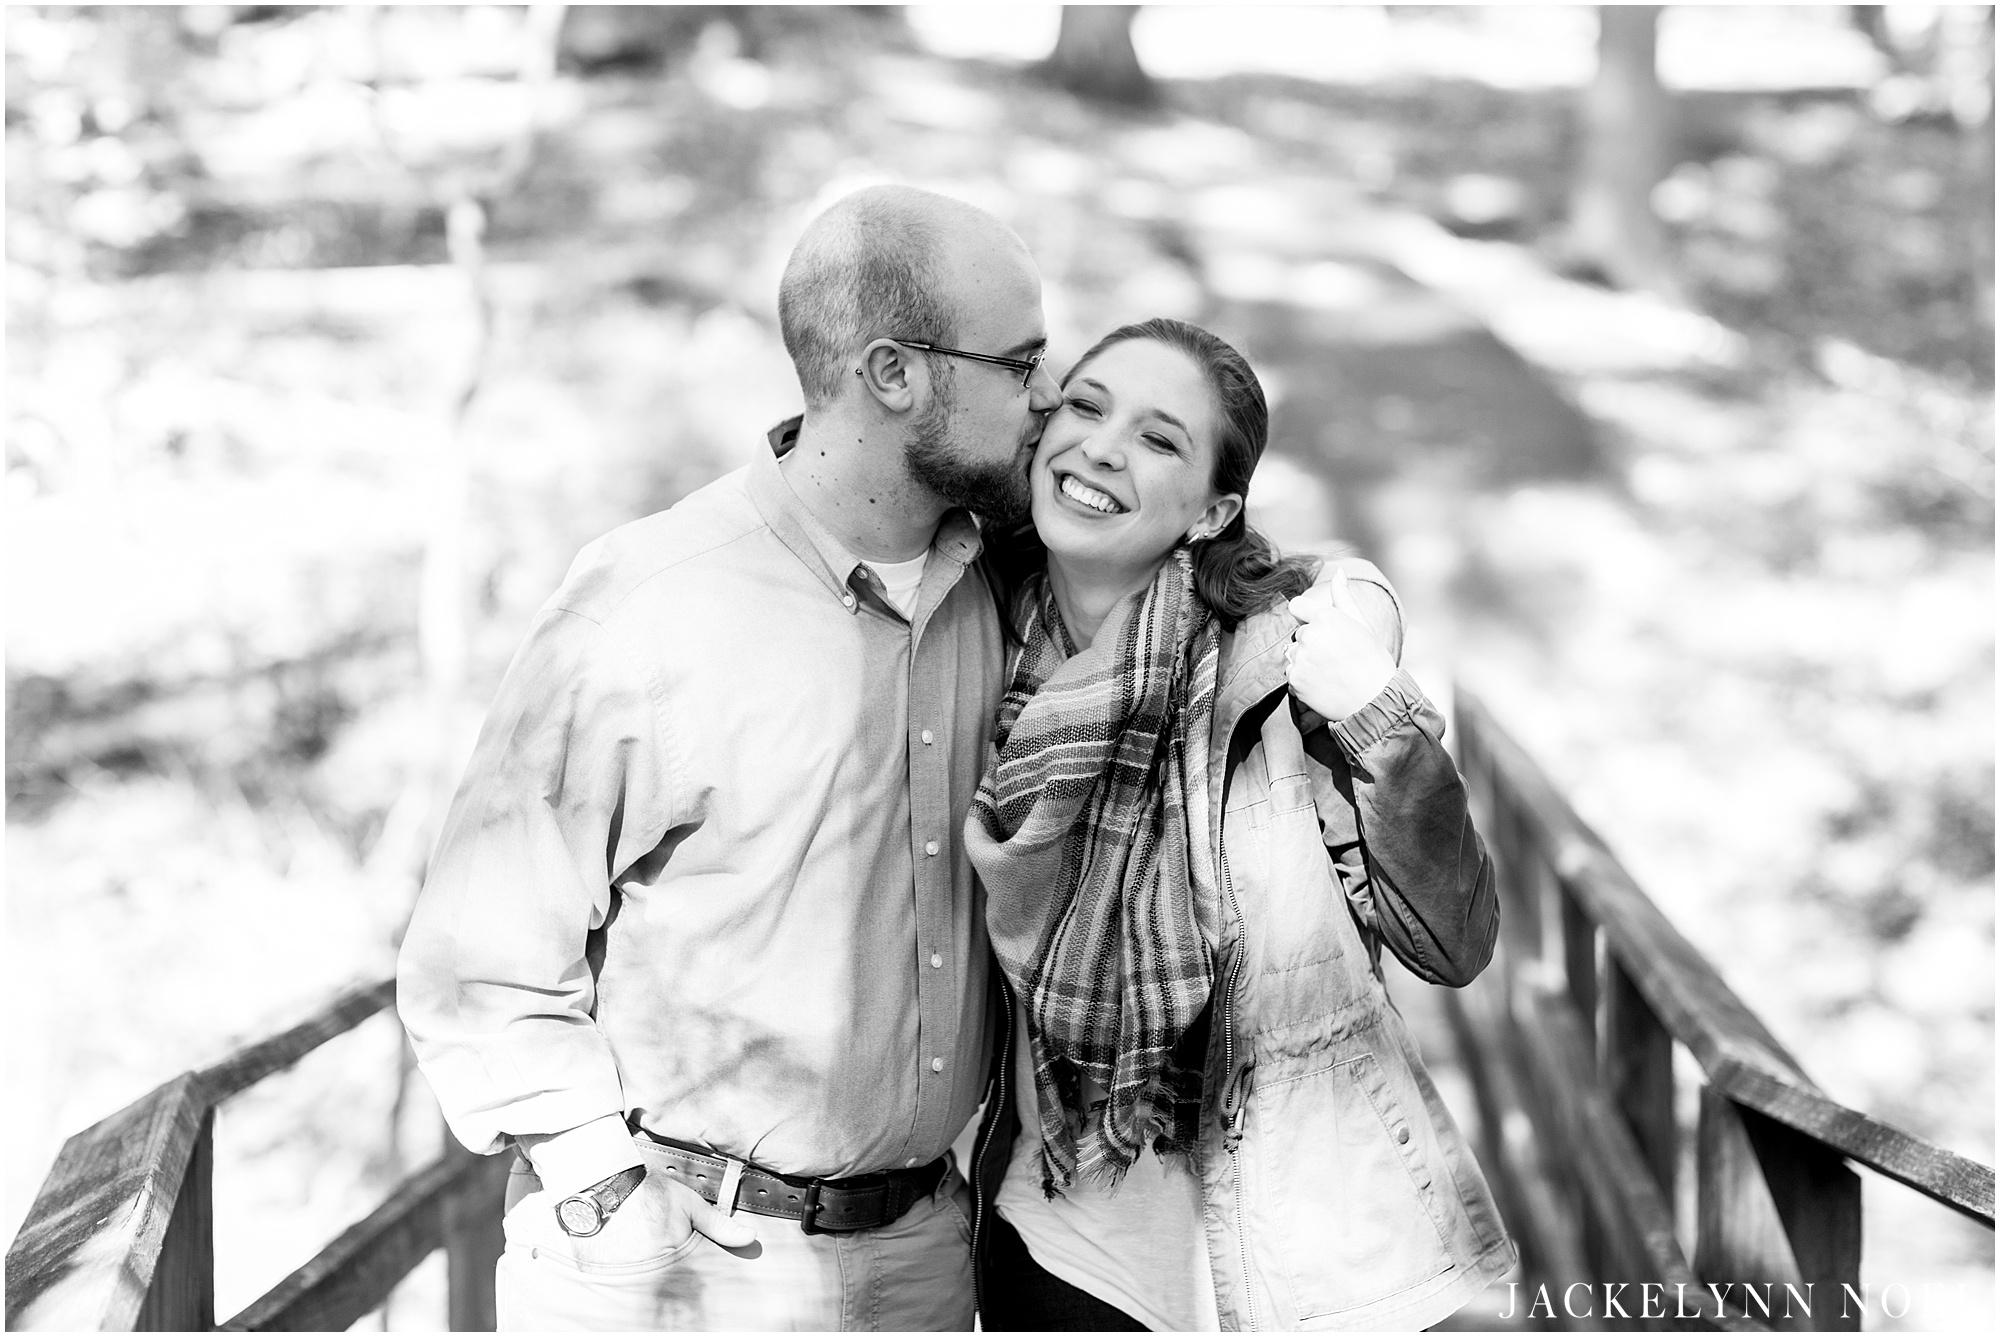 Rebecca & Jake - Powder Valley Kirkwood, Missouri Engagement Session by Jackelynn Noel Photography